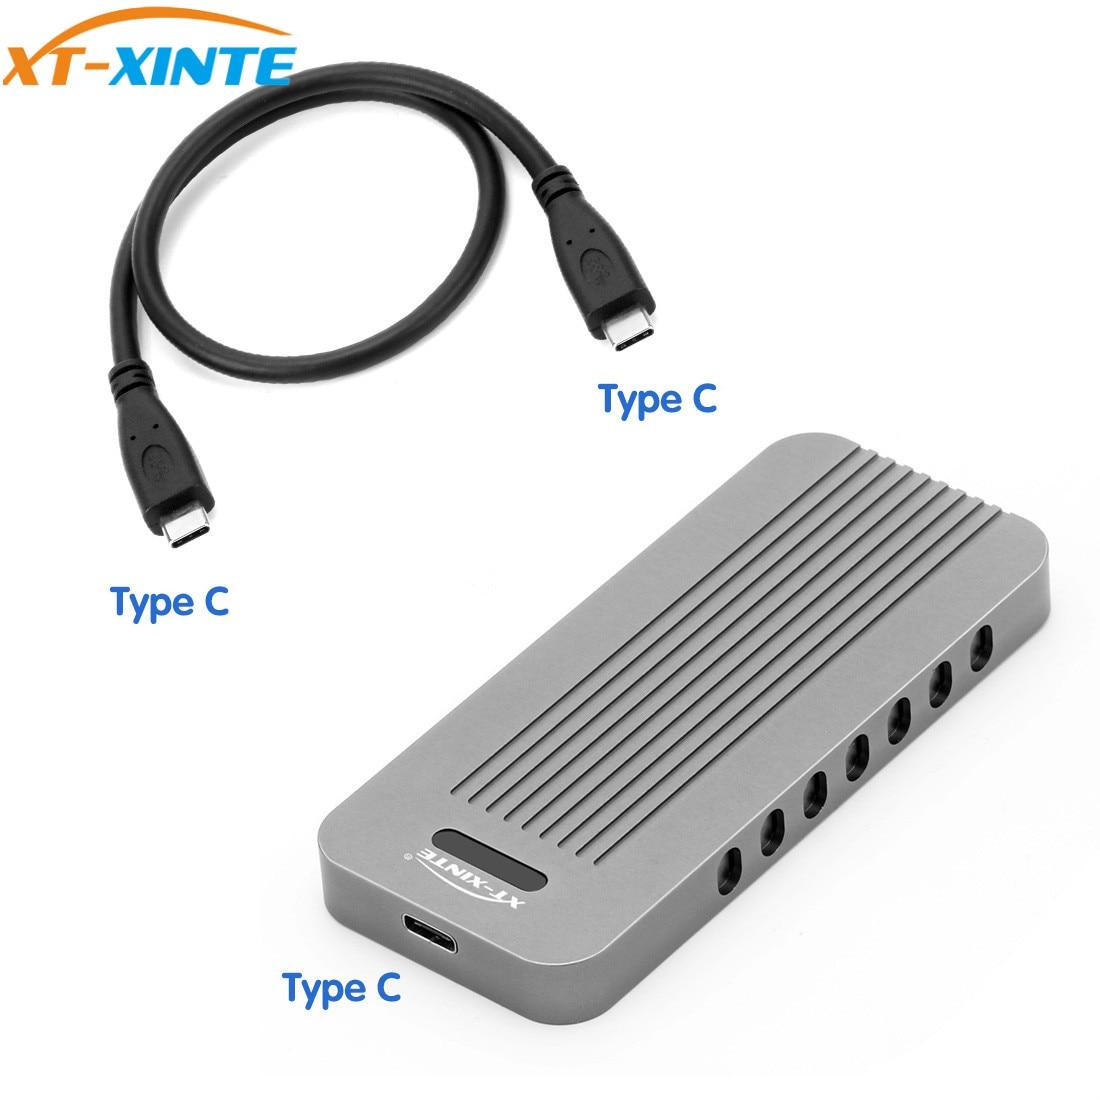 XT-XINTE NVMe External M.2 HDD Enclosure Pcie Protocol M-Key High Speed SSD